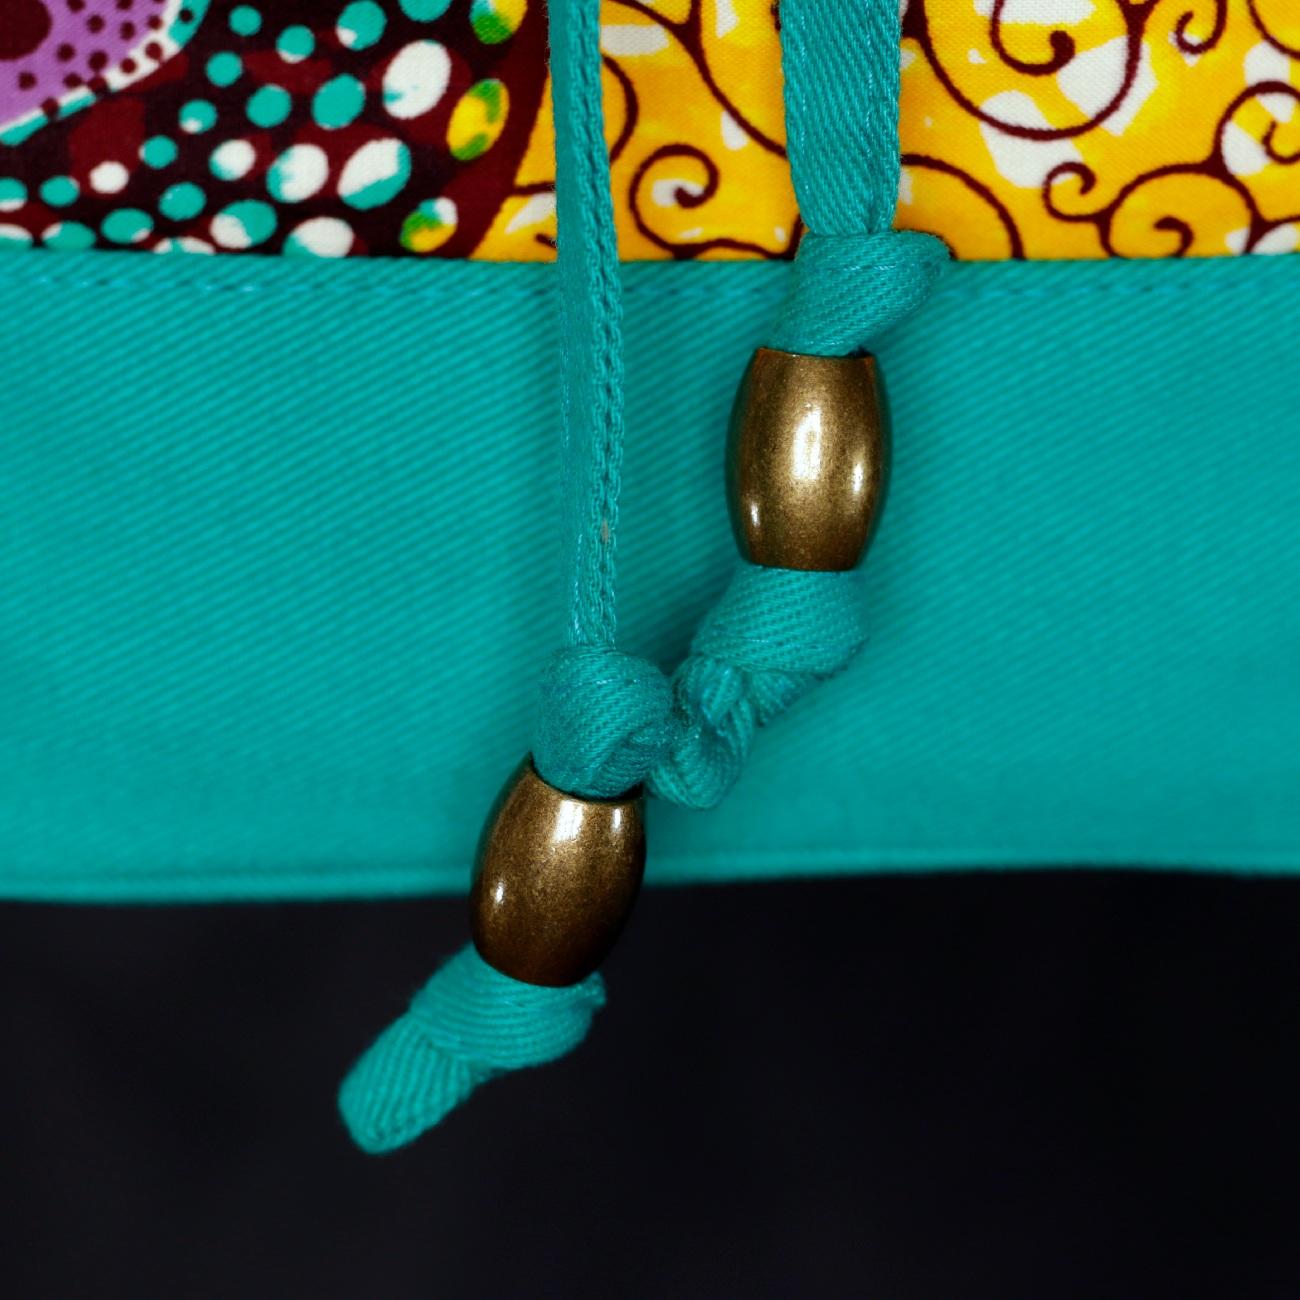 Bolsa Saco Transversal Tecido Africano Amarelo e Turquesa